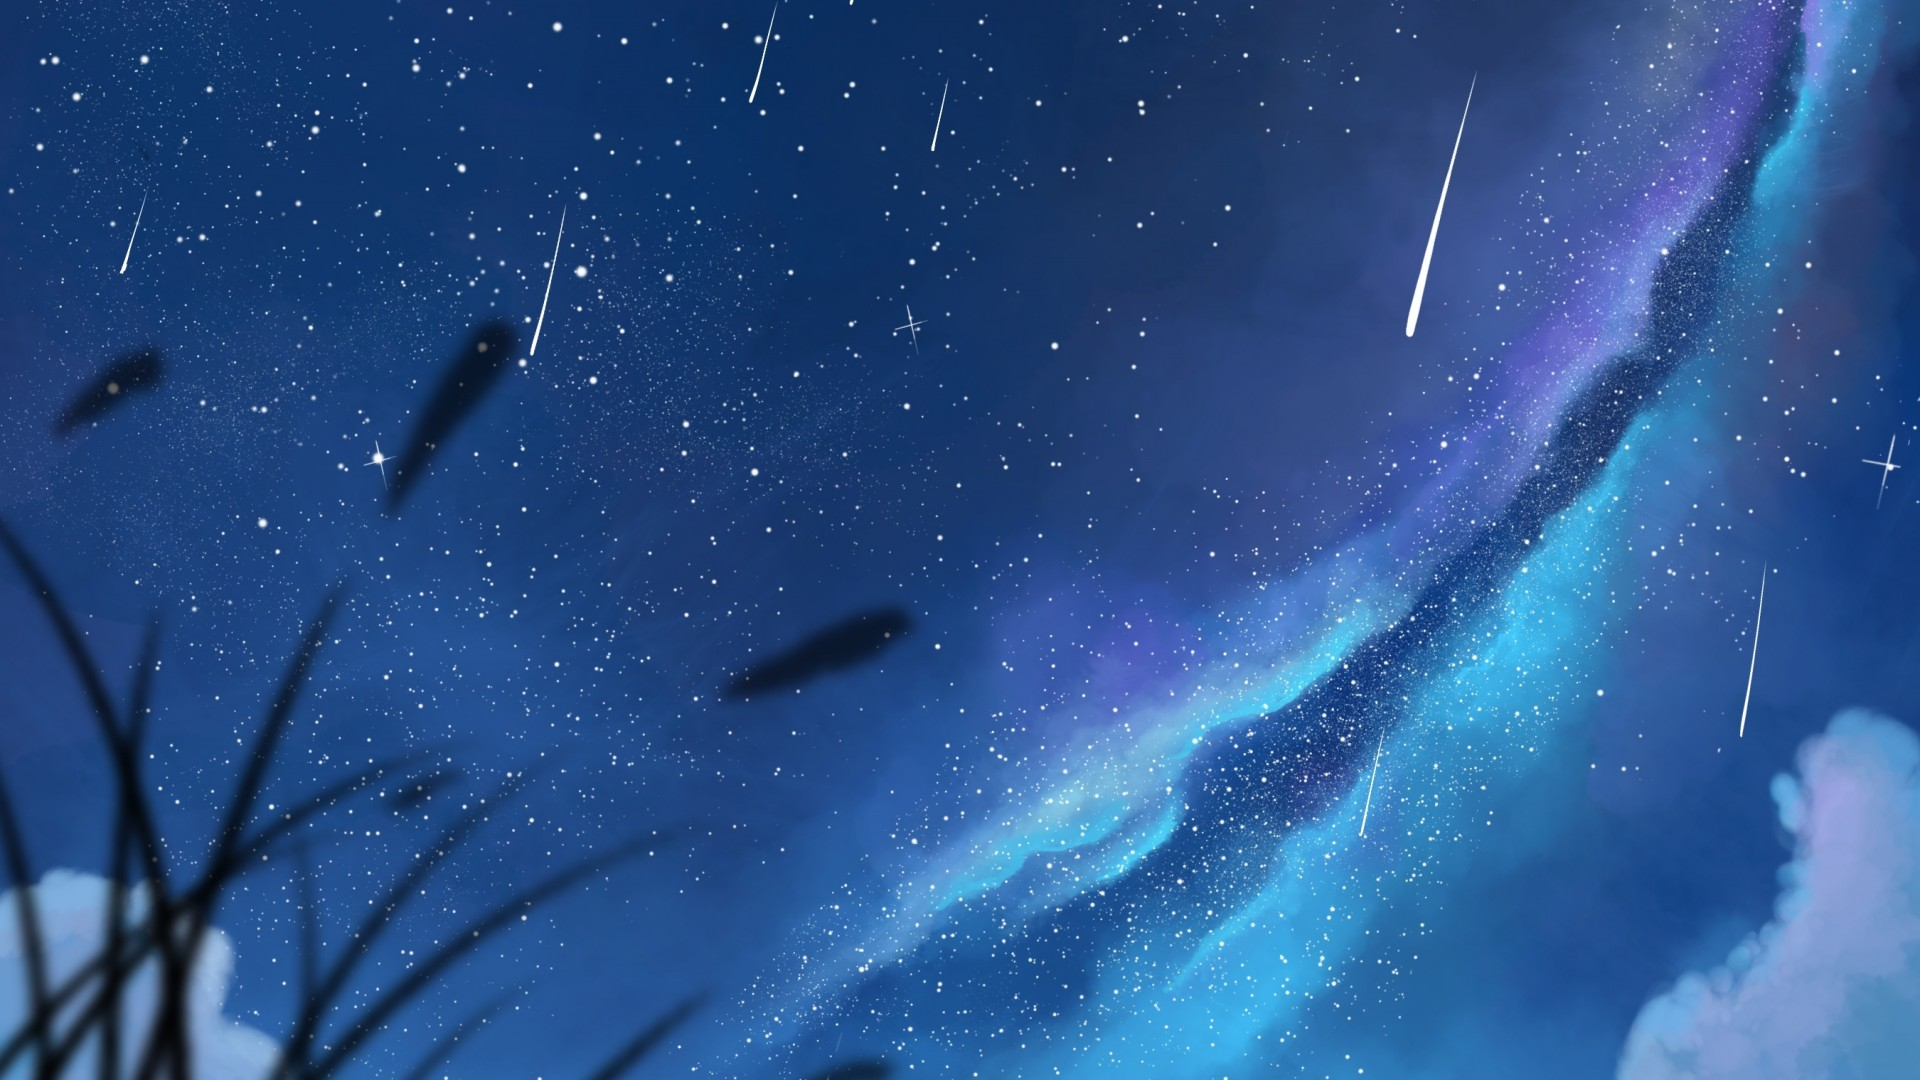 Sky hd wallpaper background image 1920x1080 id - Anime sky background ...